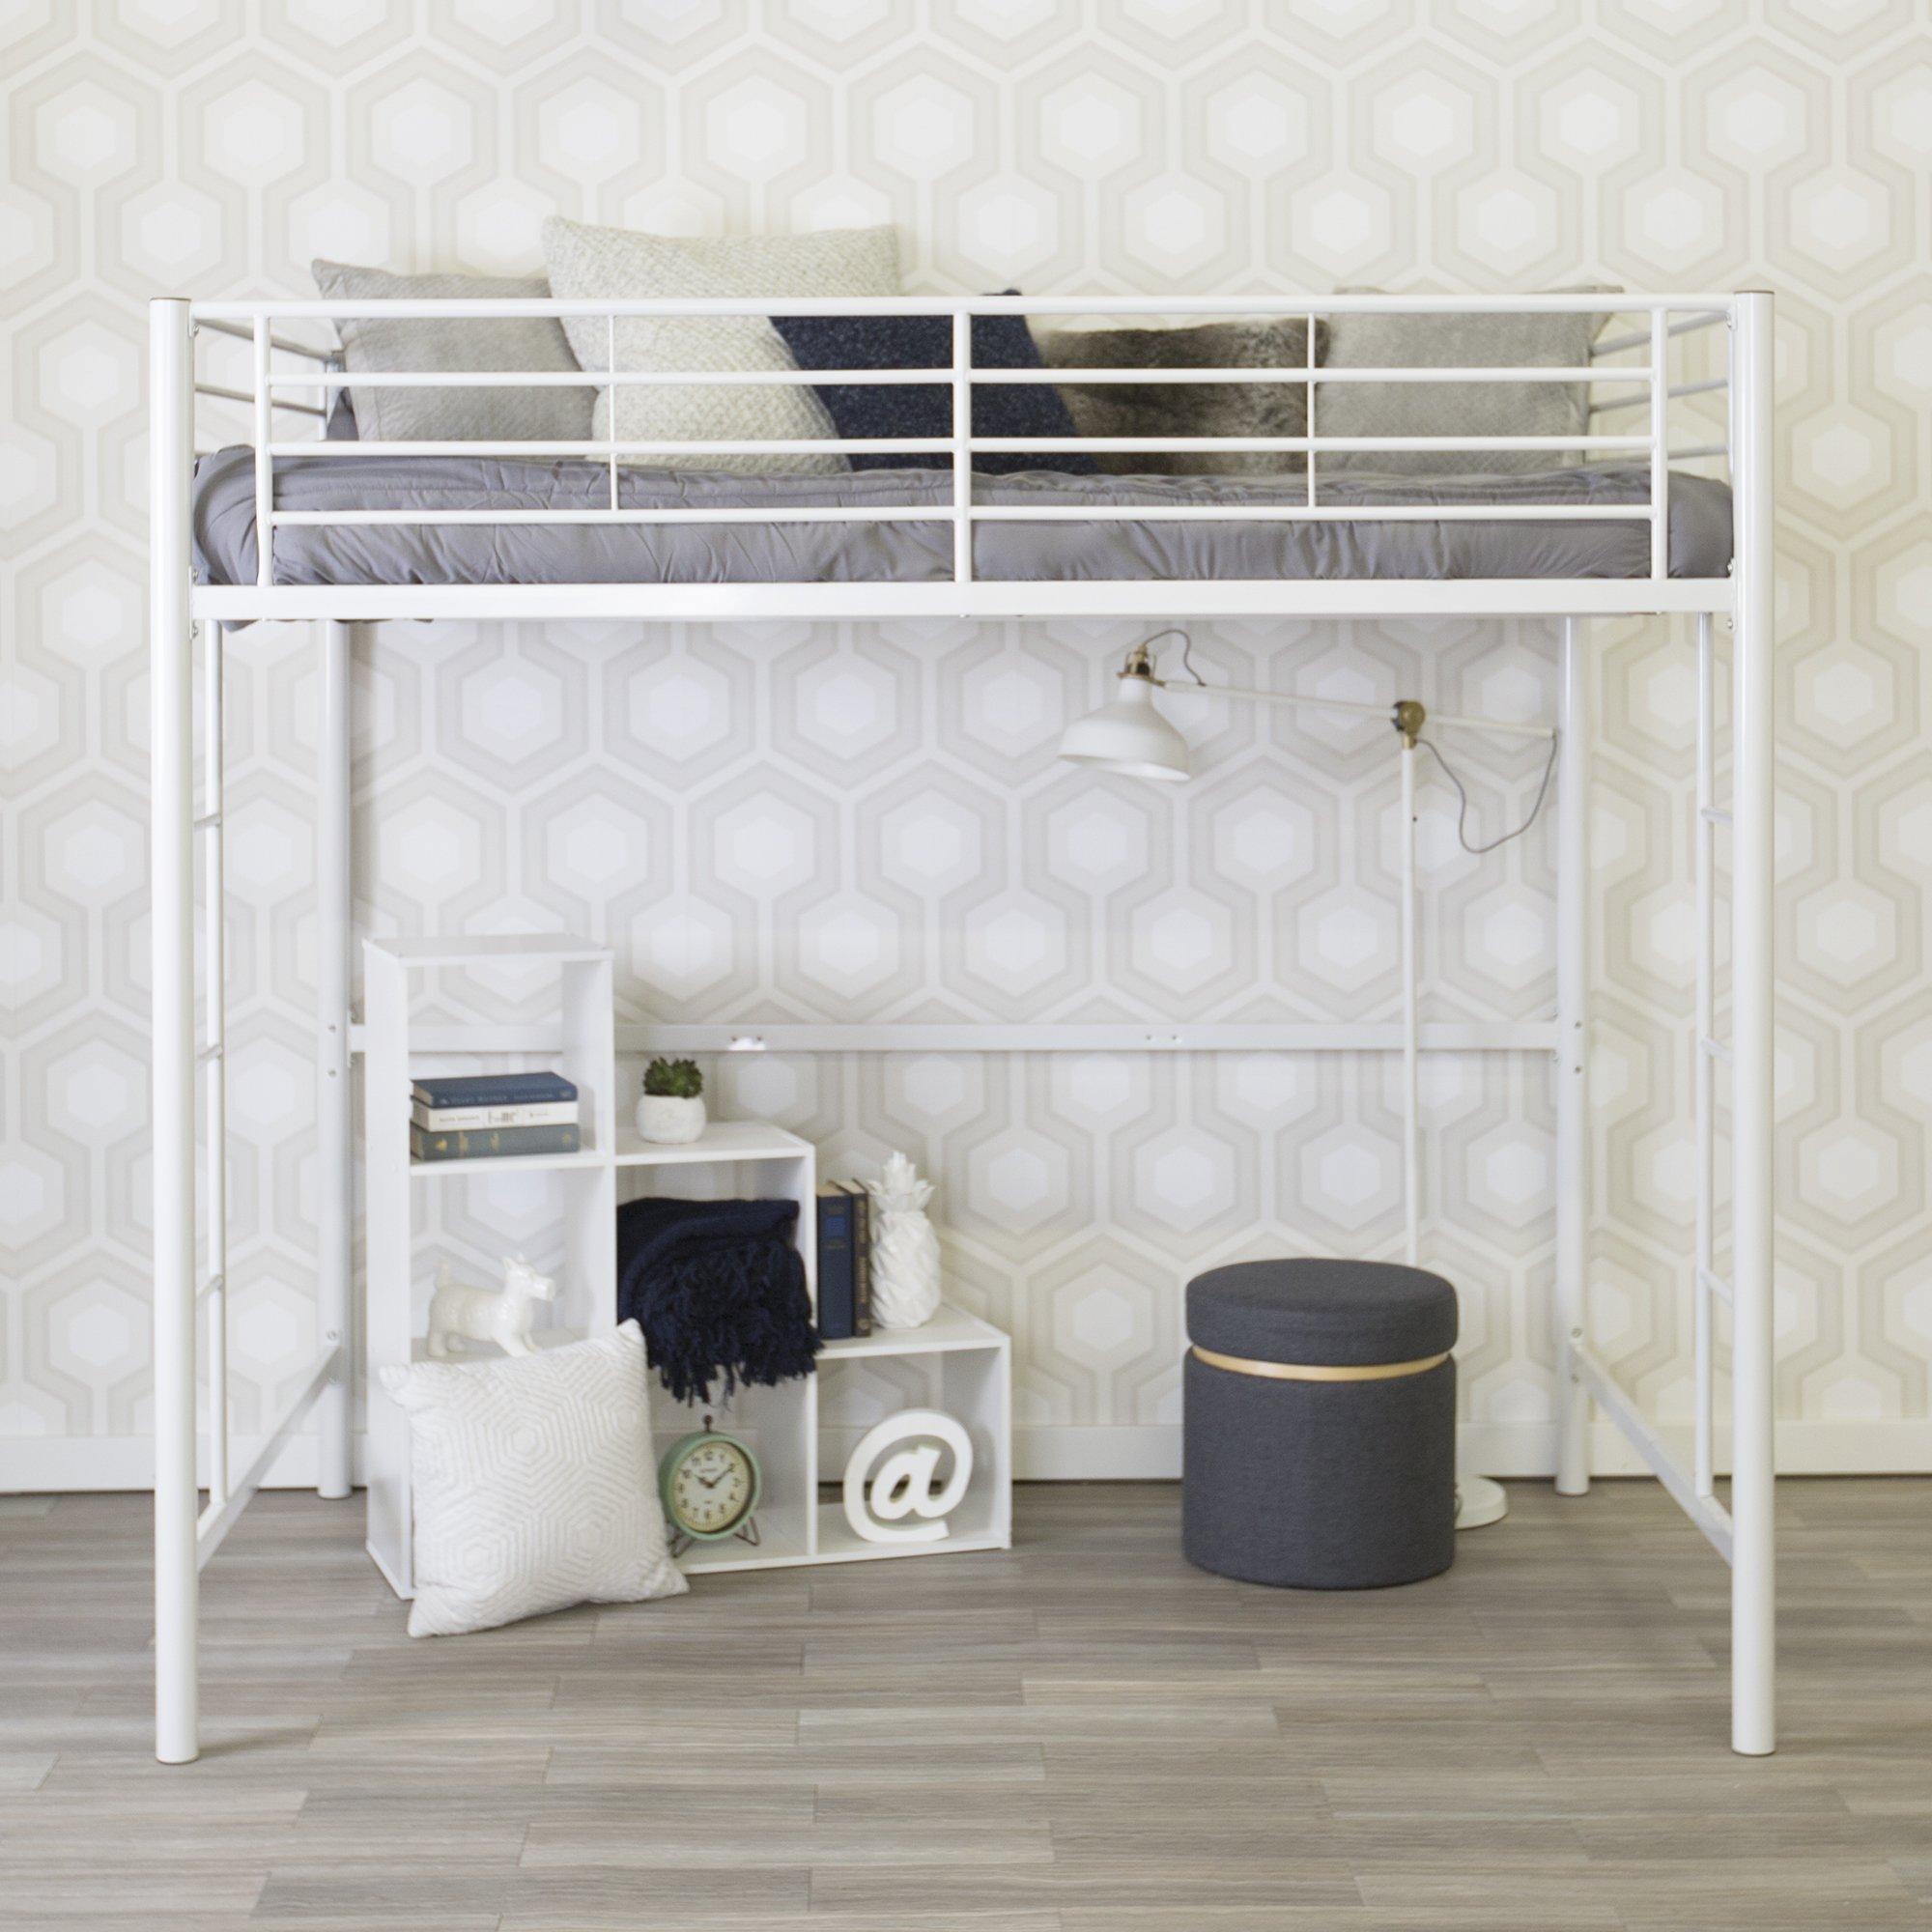 WE Furniture Full Metal Loft Bed - White